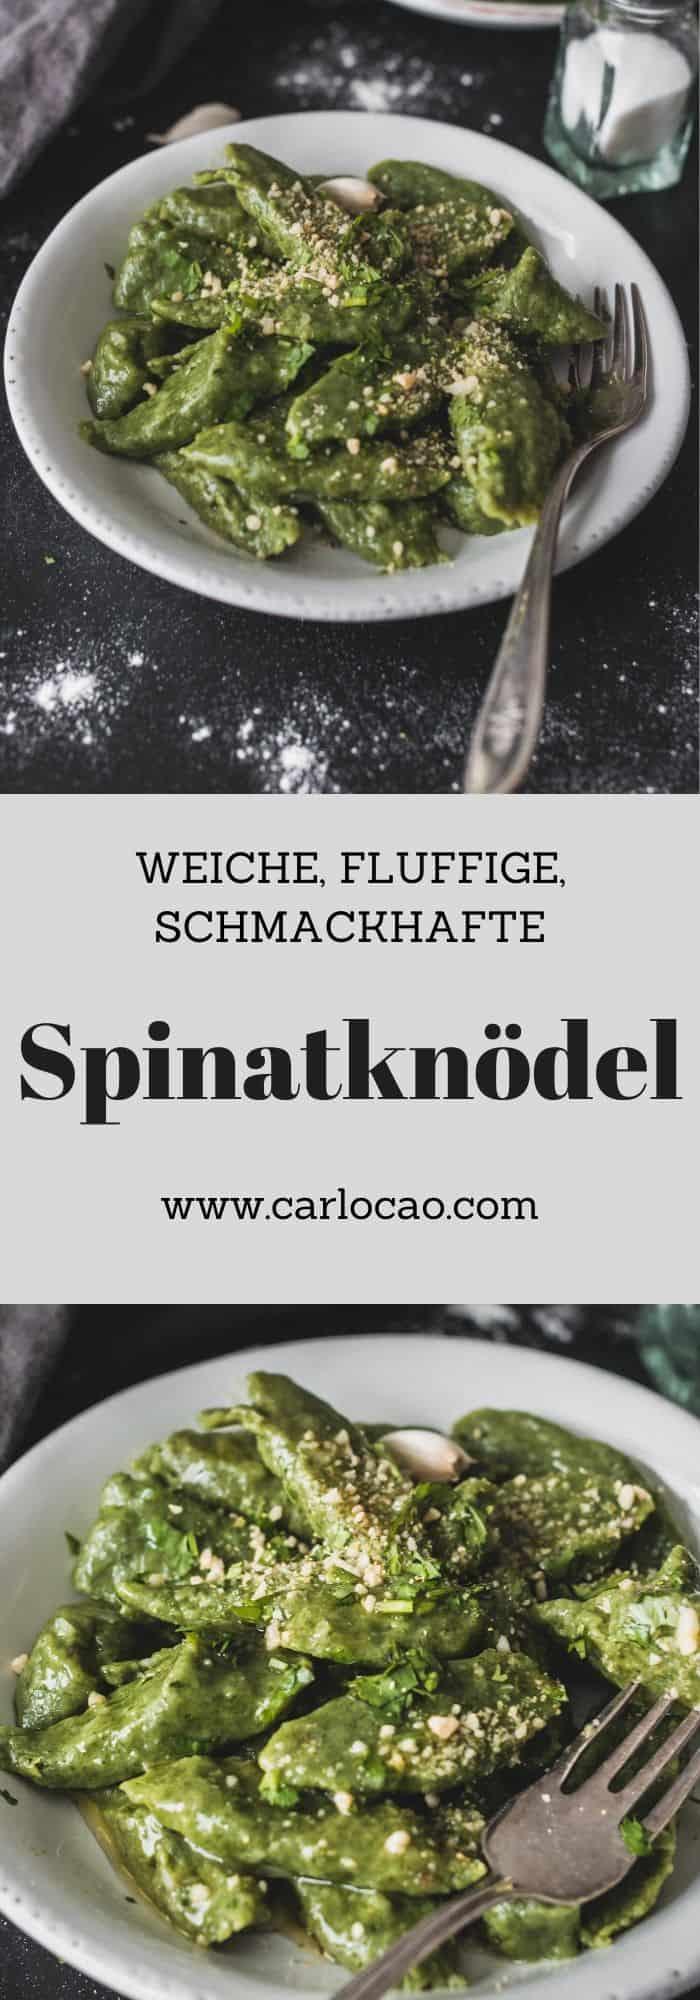 Capunet - Spinatknödel